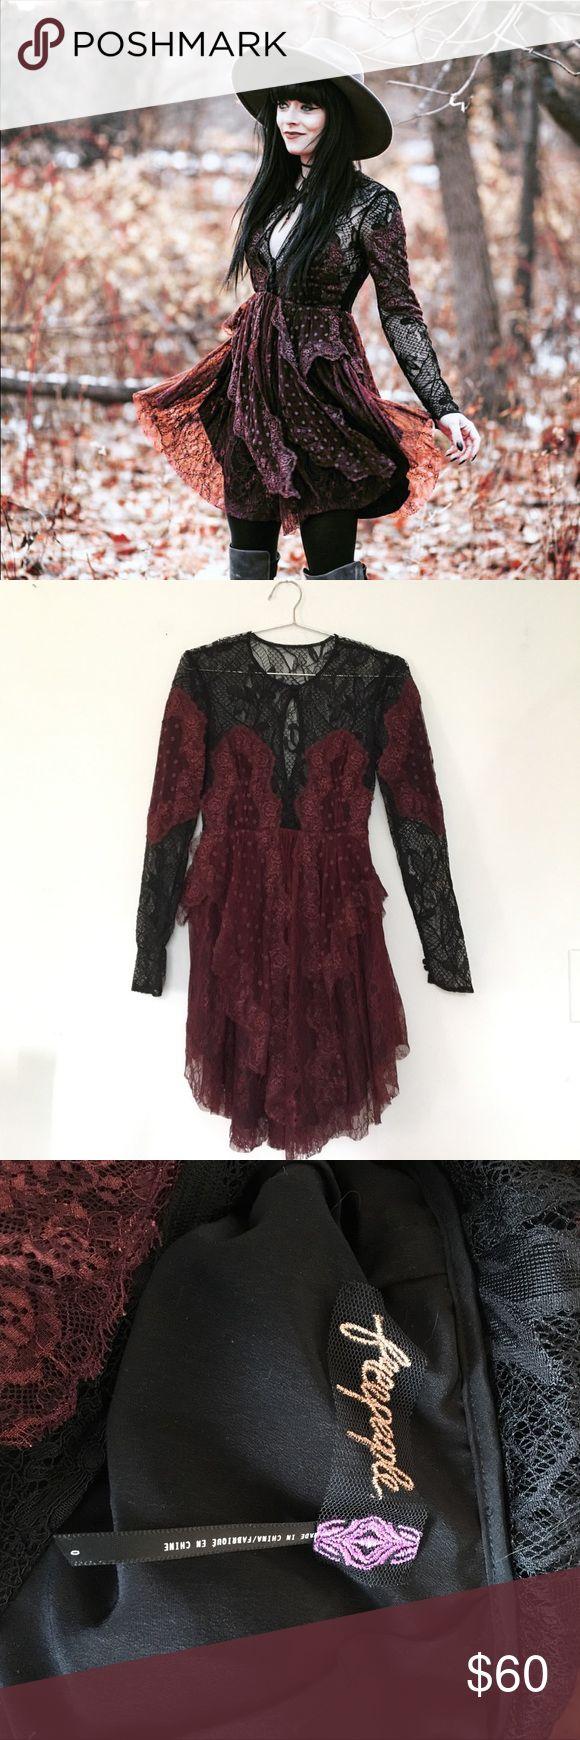 Free People Lace Dress Maroon & Black lace dress from Free People! Free People Dresses Long Sleeve